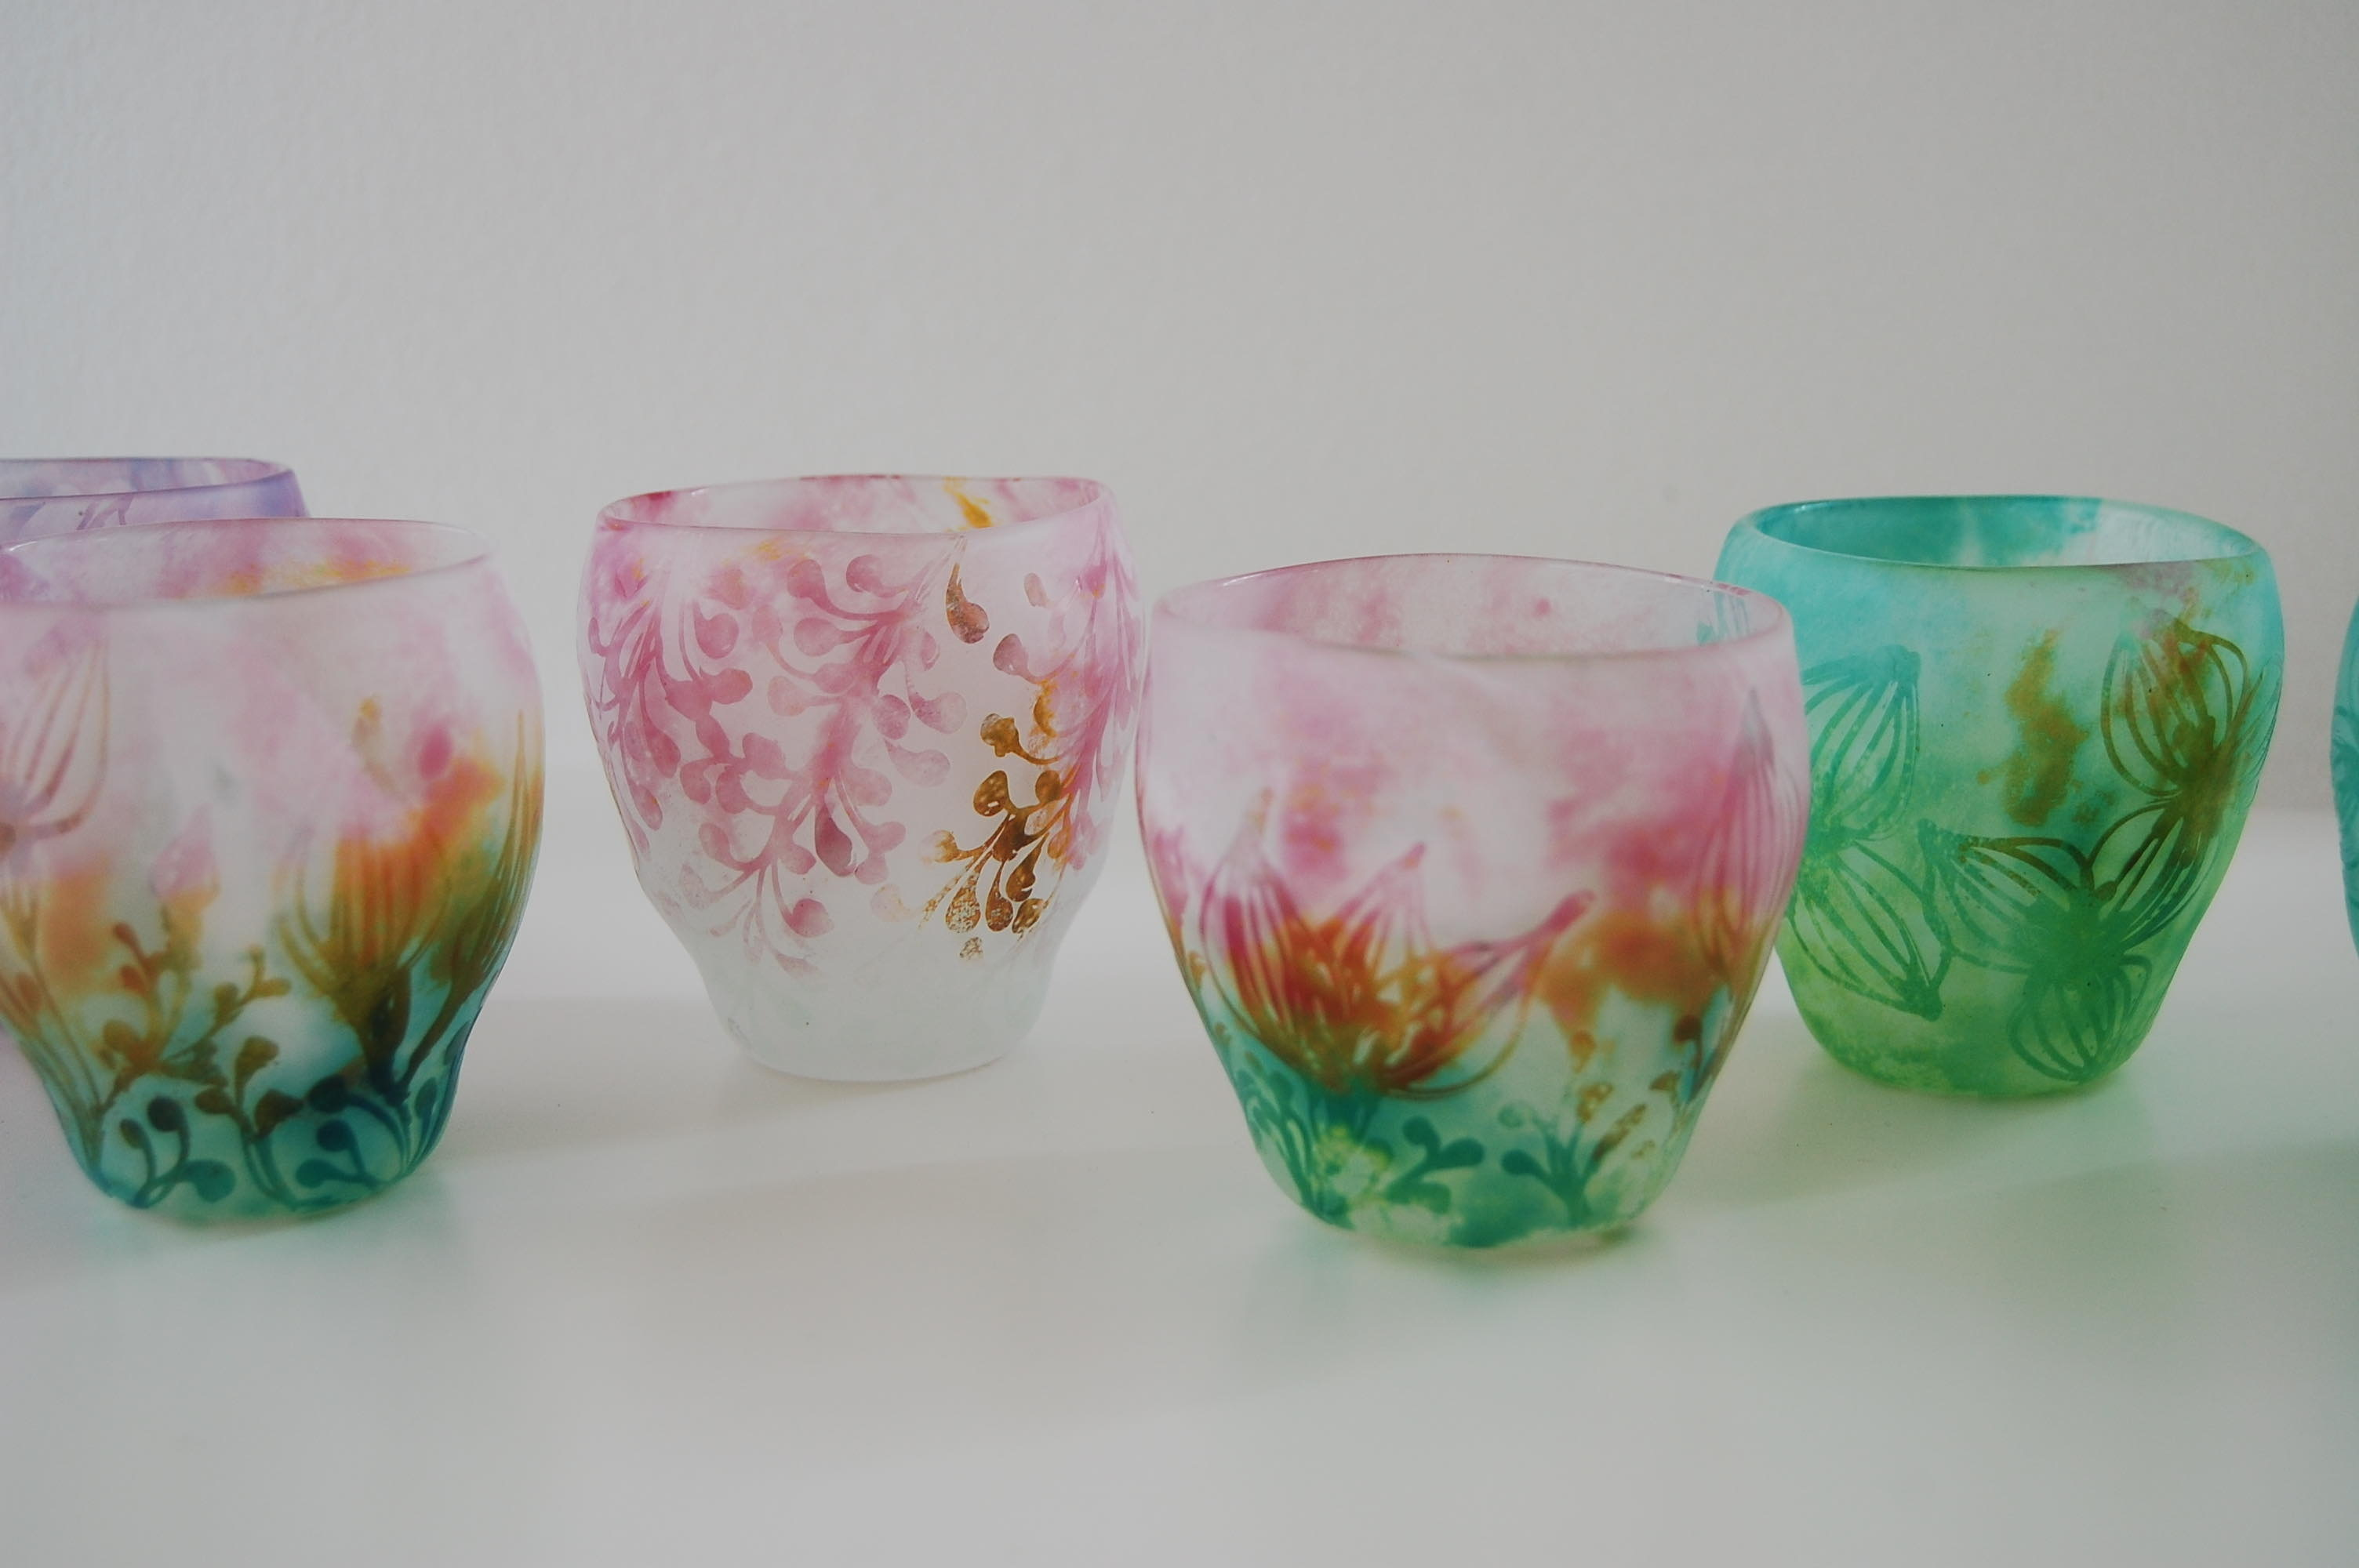 Bocciolo展 中野由紀子さんNostalgia花器・グラス_b0353974_15071914.jpg